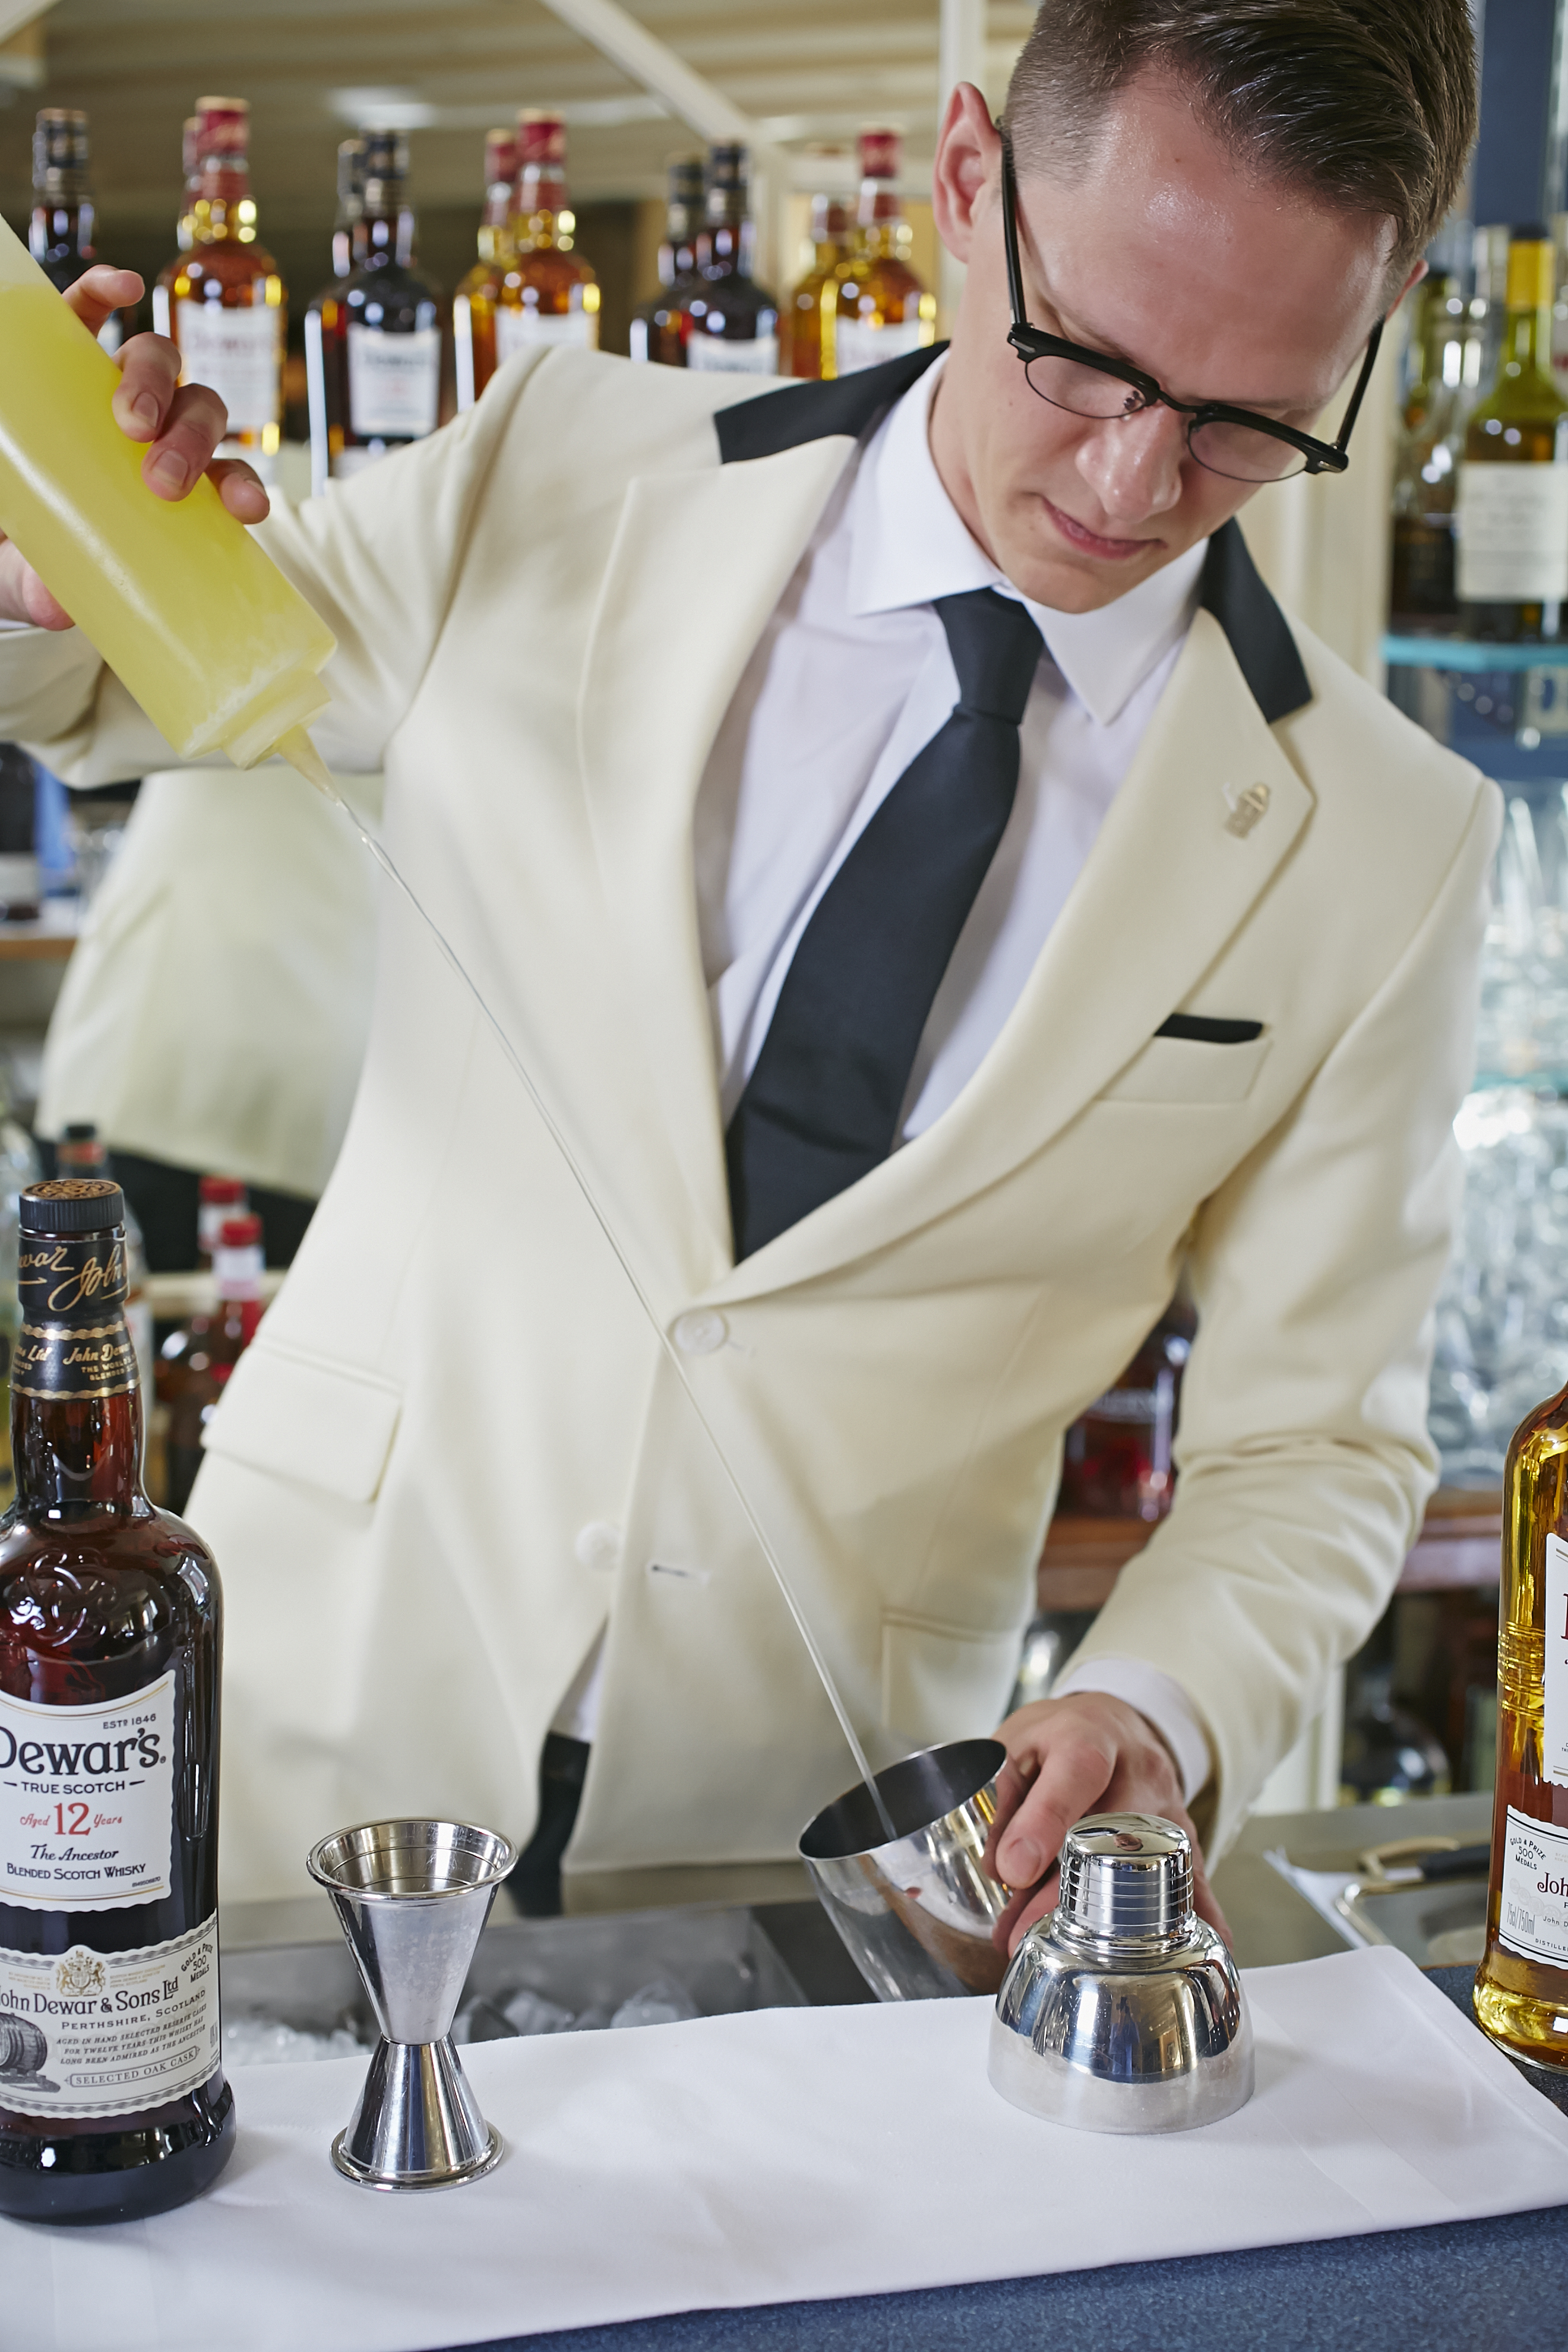 LONDON BARS – Dewars whisky, definitely shaken and tastebuds